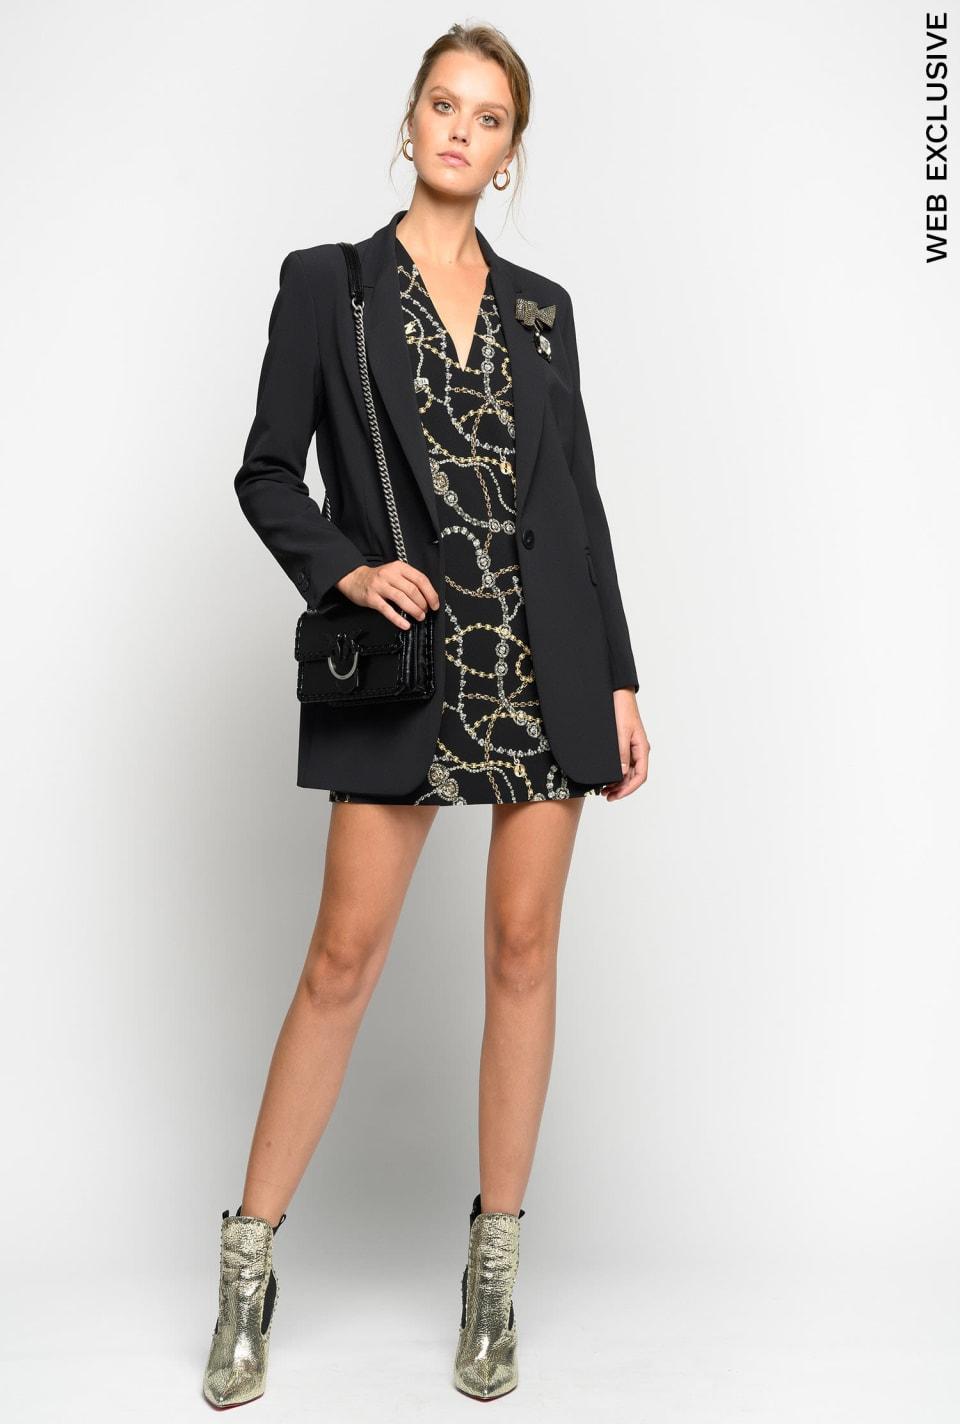 Jewel-print tunic dress